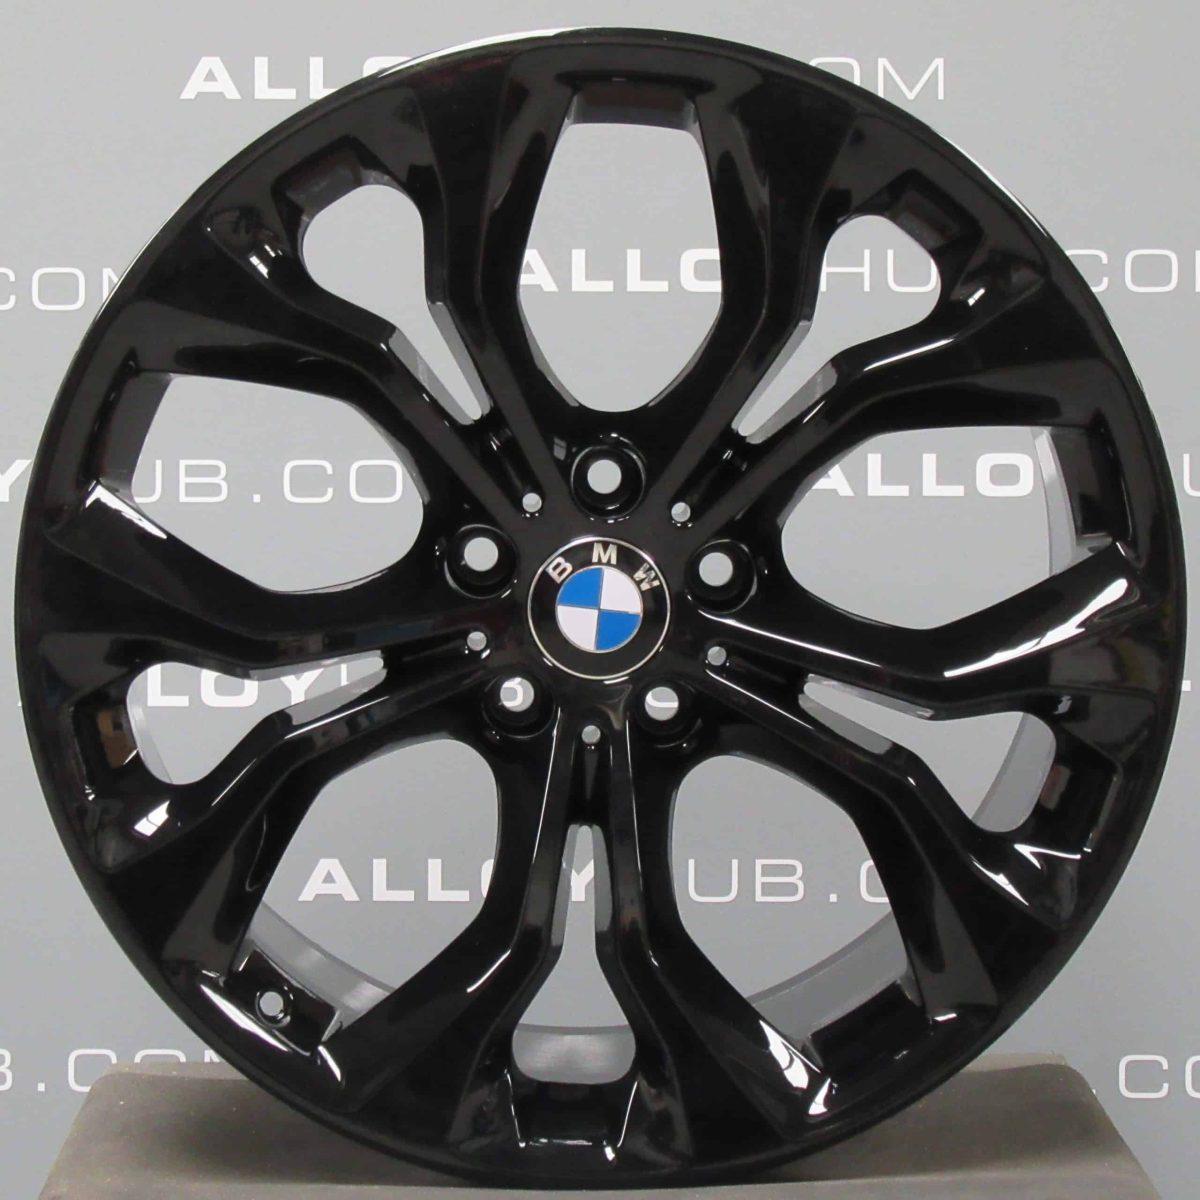 "BMW X5 X6 F15 F16 451M Sport Performance 20"" Inch Alloy Wheels with Gloss Black Finish 36116853959 36116853960"